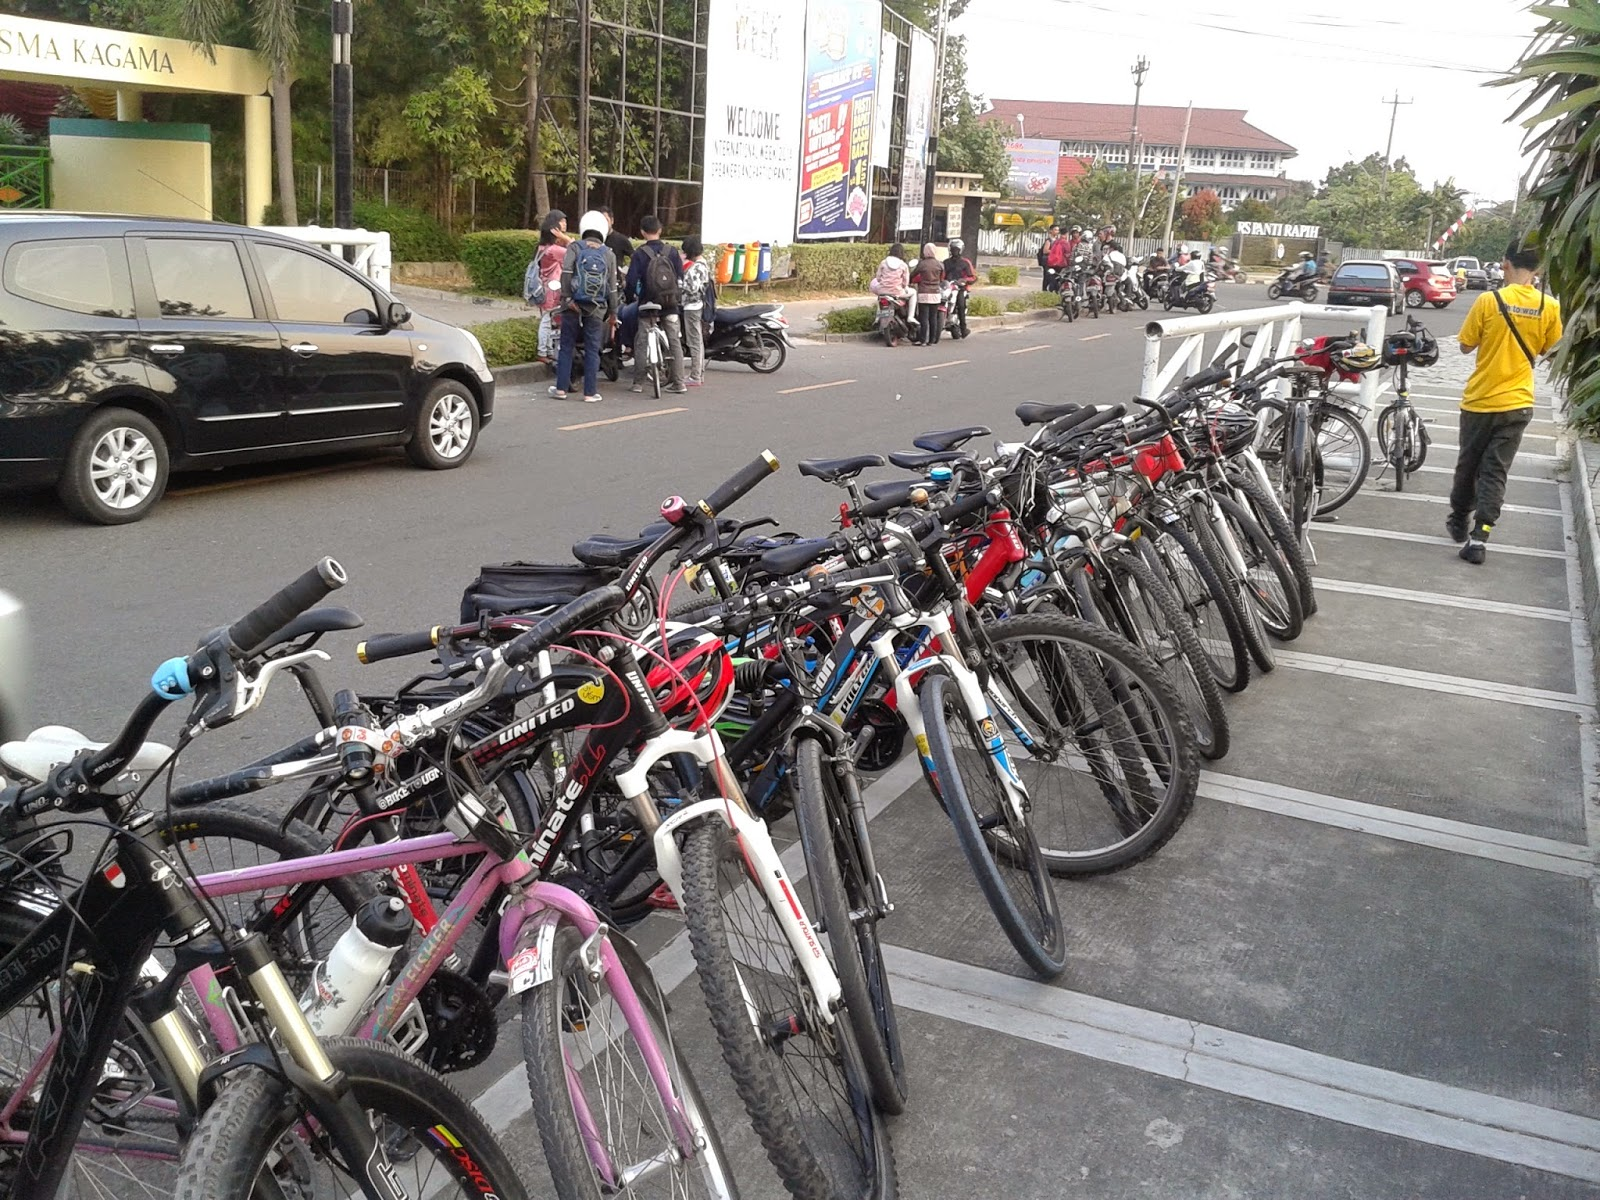 Sepeda terpakir rapi ditepian jalan